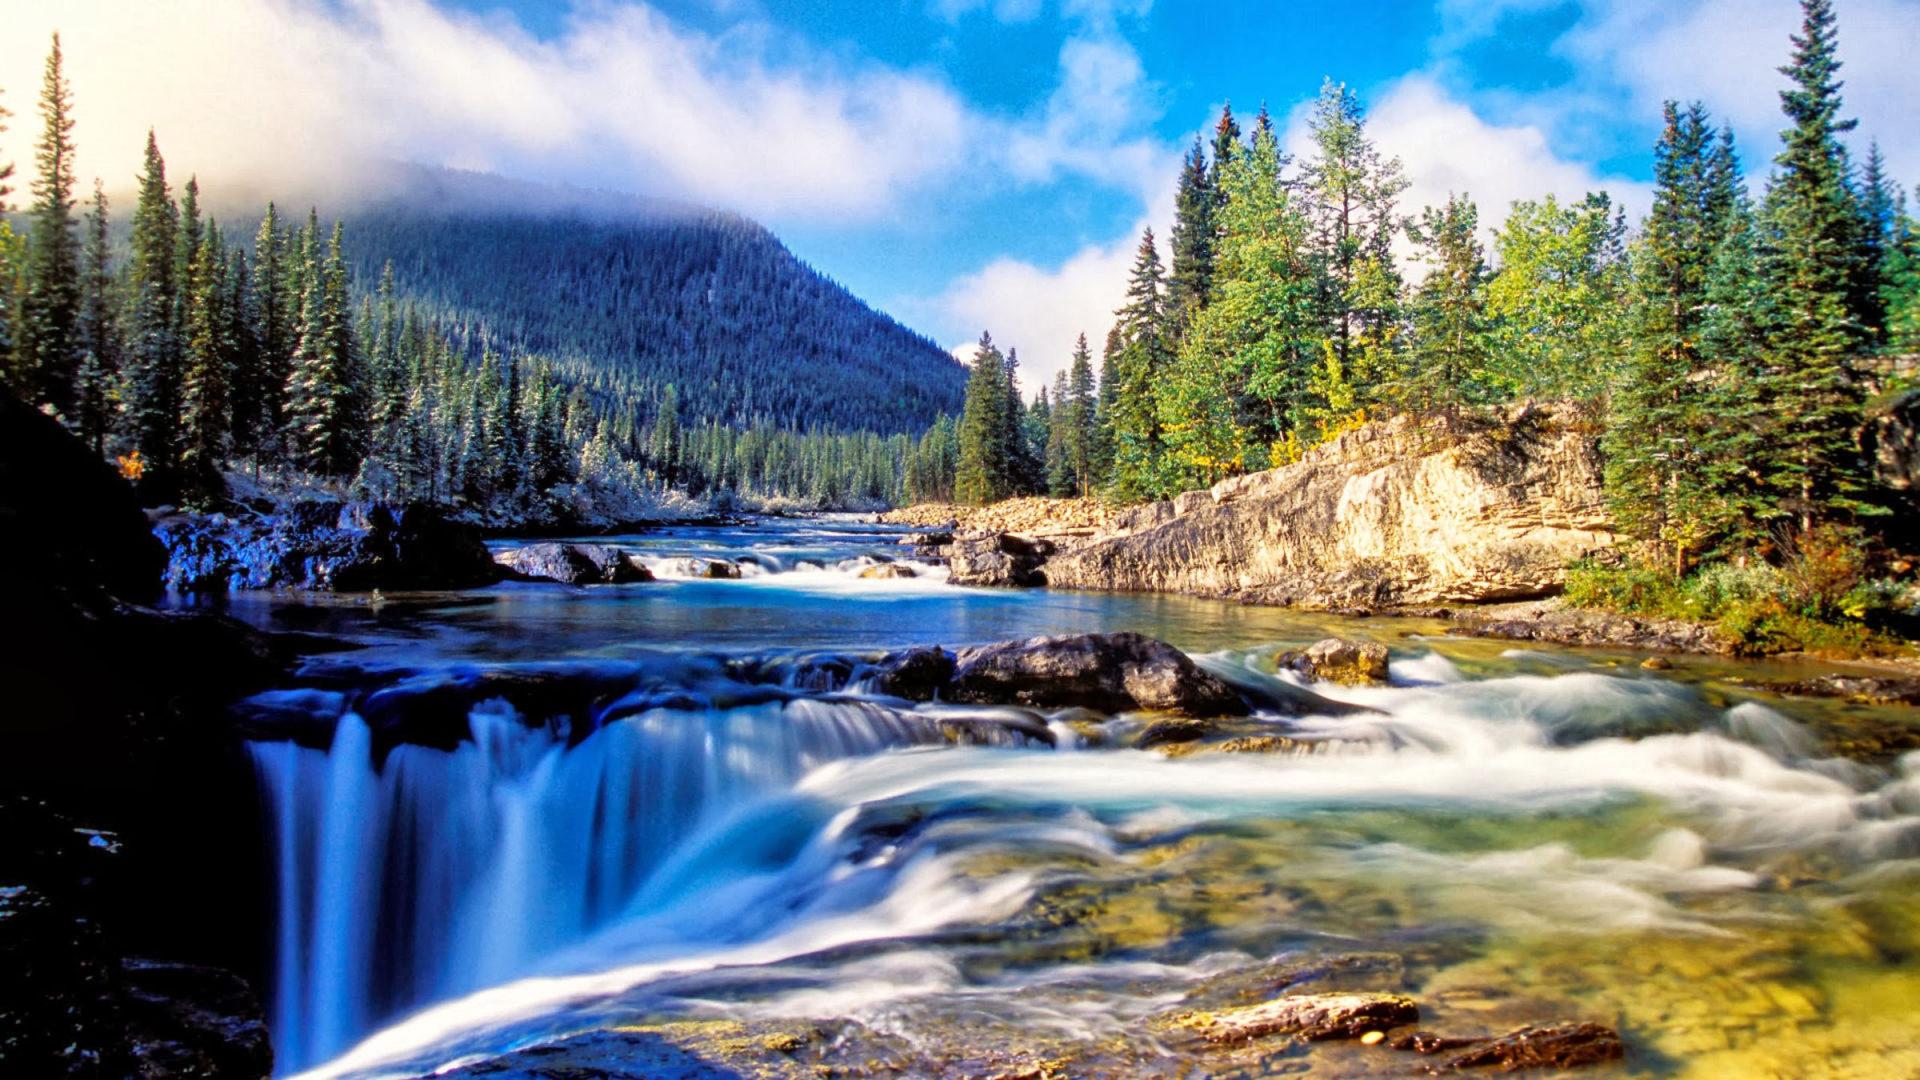 Free Desktop Wallpaper Niagara Falls Nature Mountain Dense Spruce Forest River Rock Waterfall